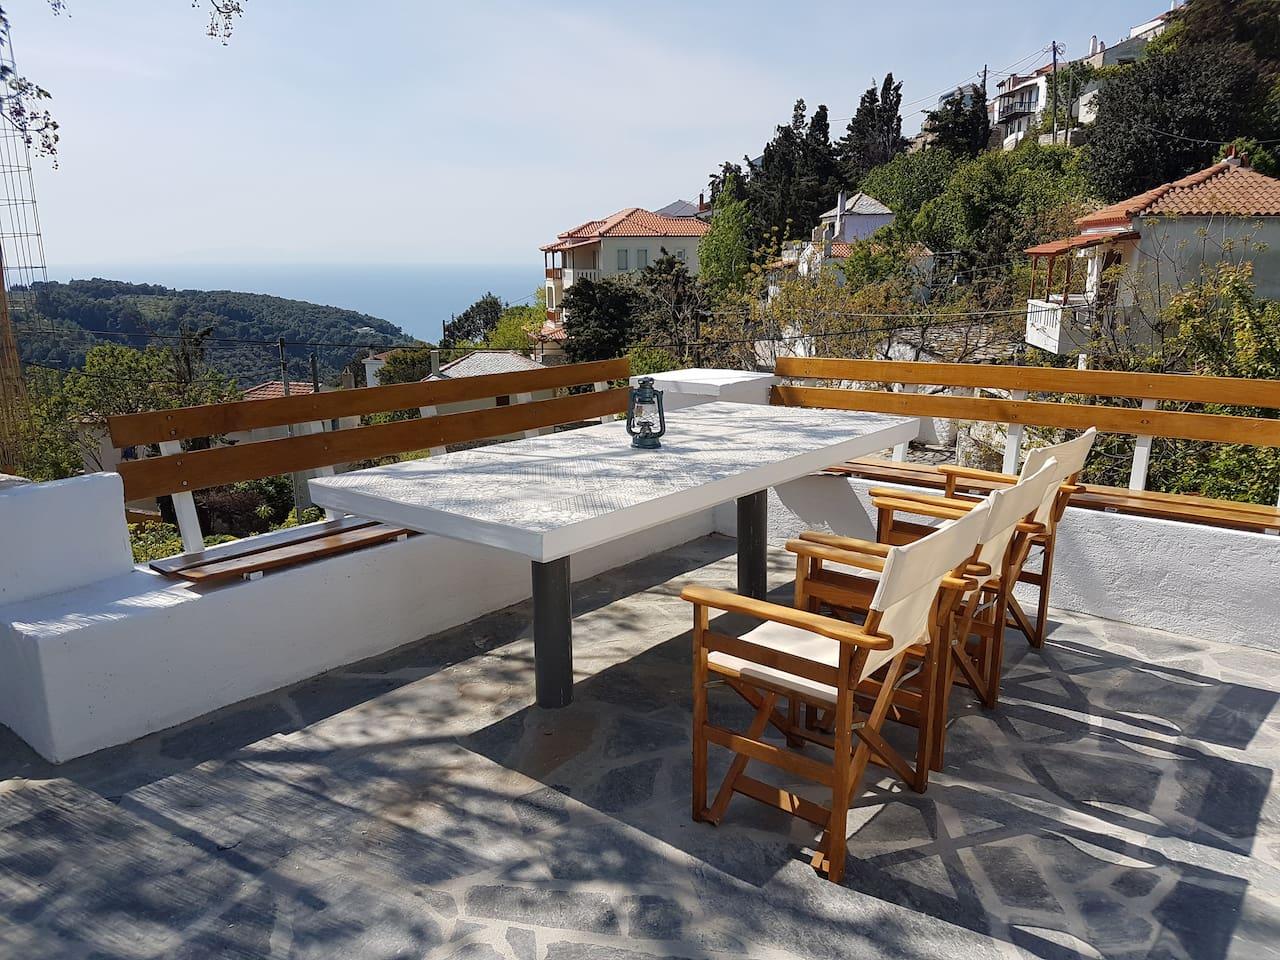 Chariklia's Outdoors Veranda